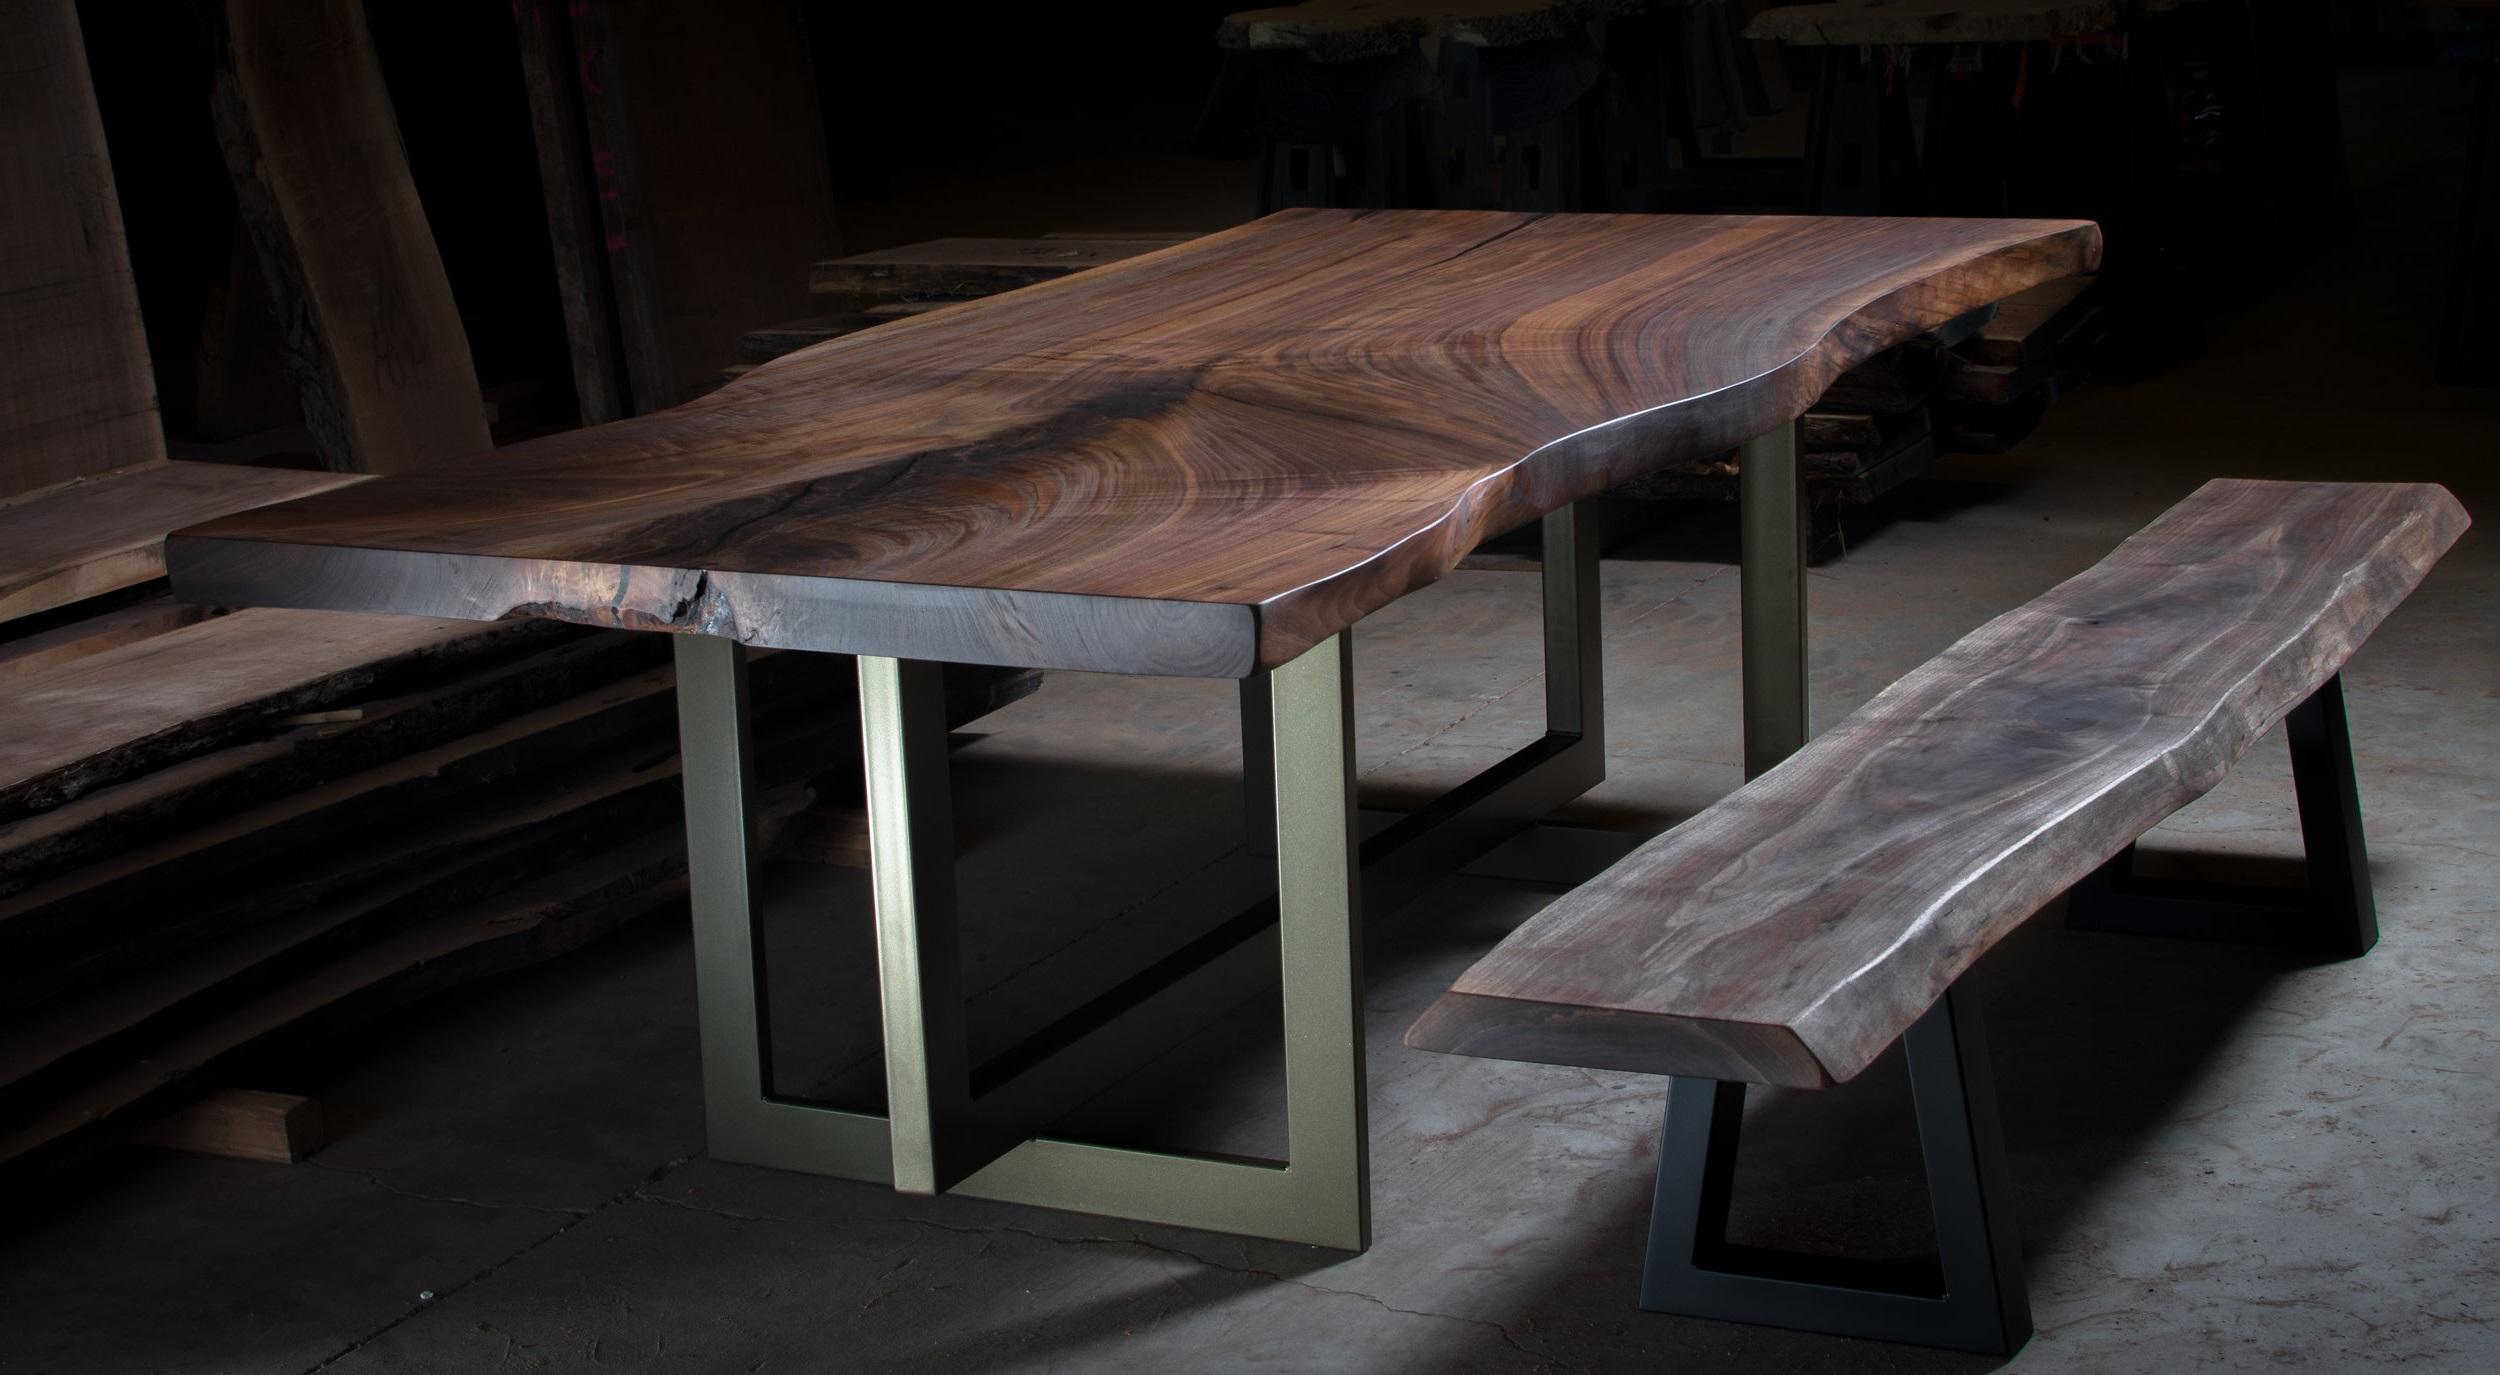 Live Edge Single Slab Table Top (Oregon Black Walnut)